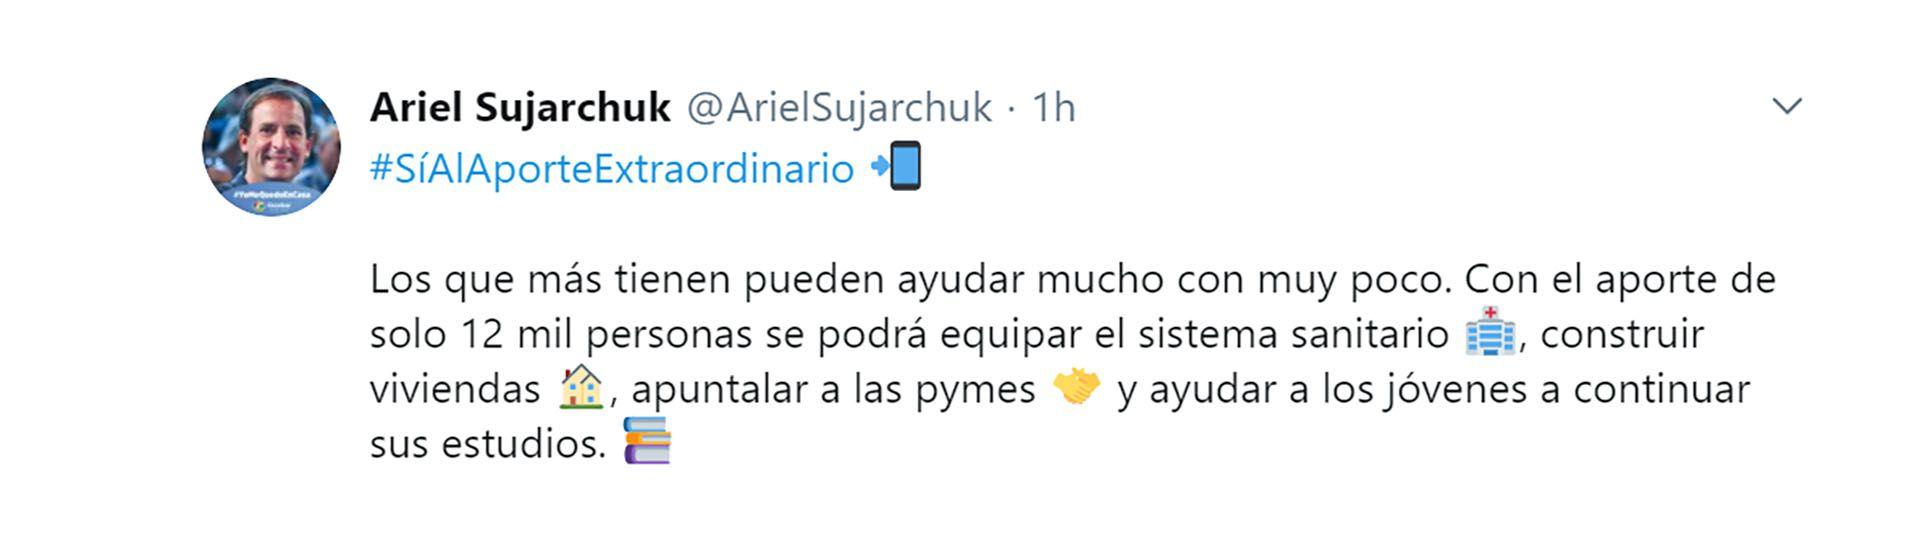 tuits intendentes respaldan impuesto a la riqueza ariel sujarchuk